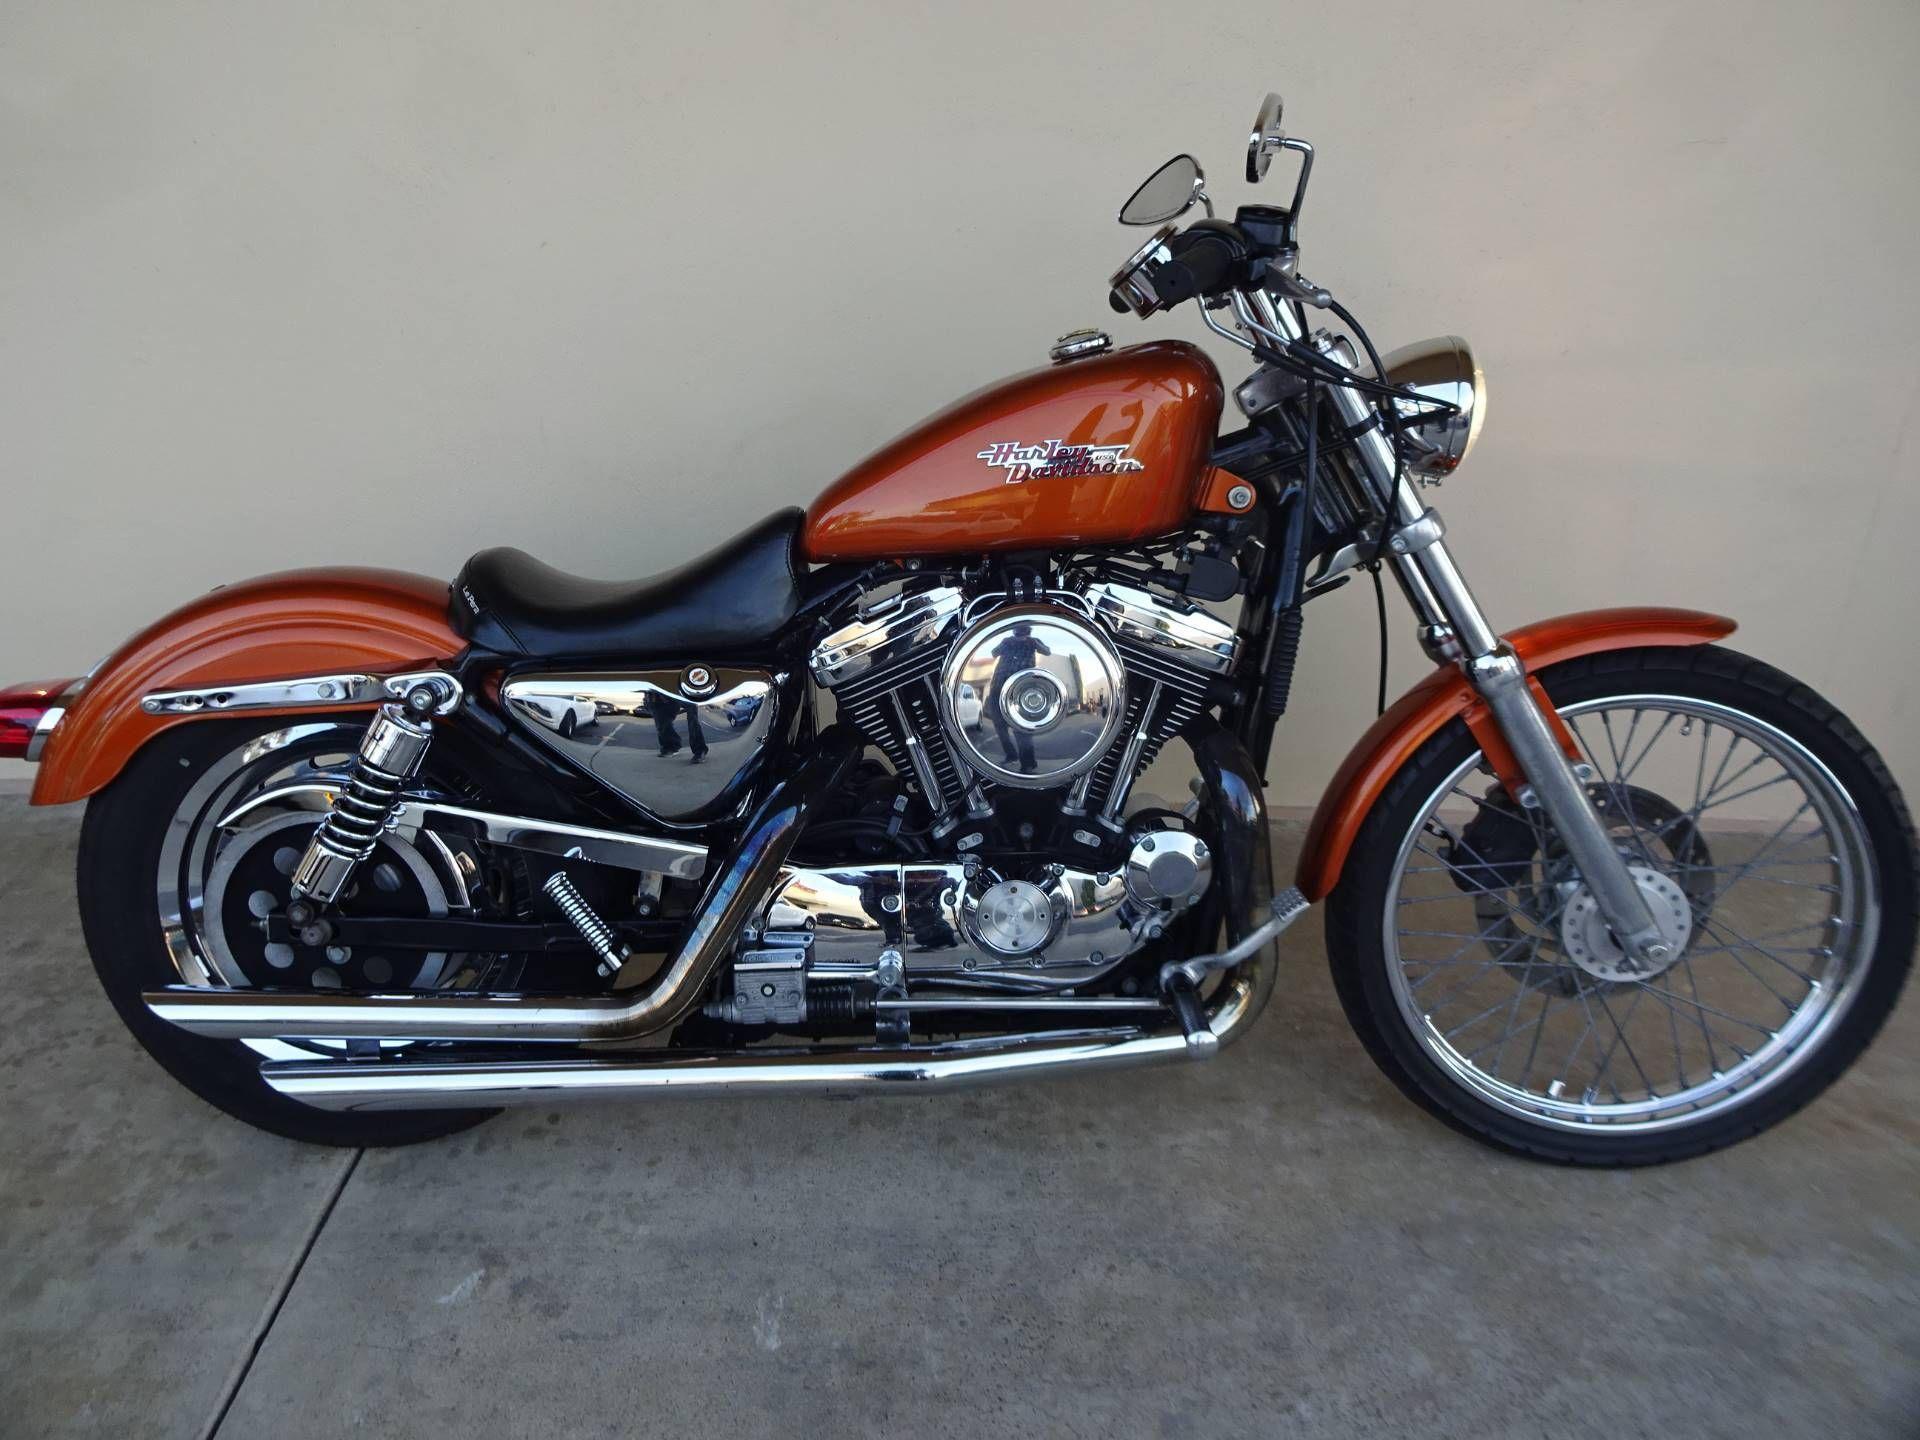 Wiring Diagram Also Harley Sportster Wiring Diagram On 2000 Sportster